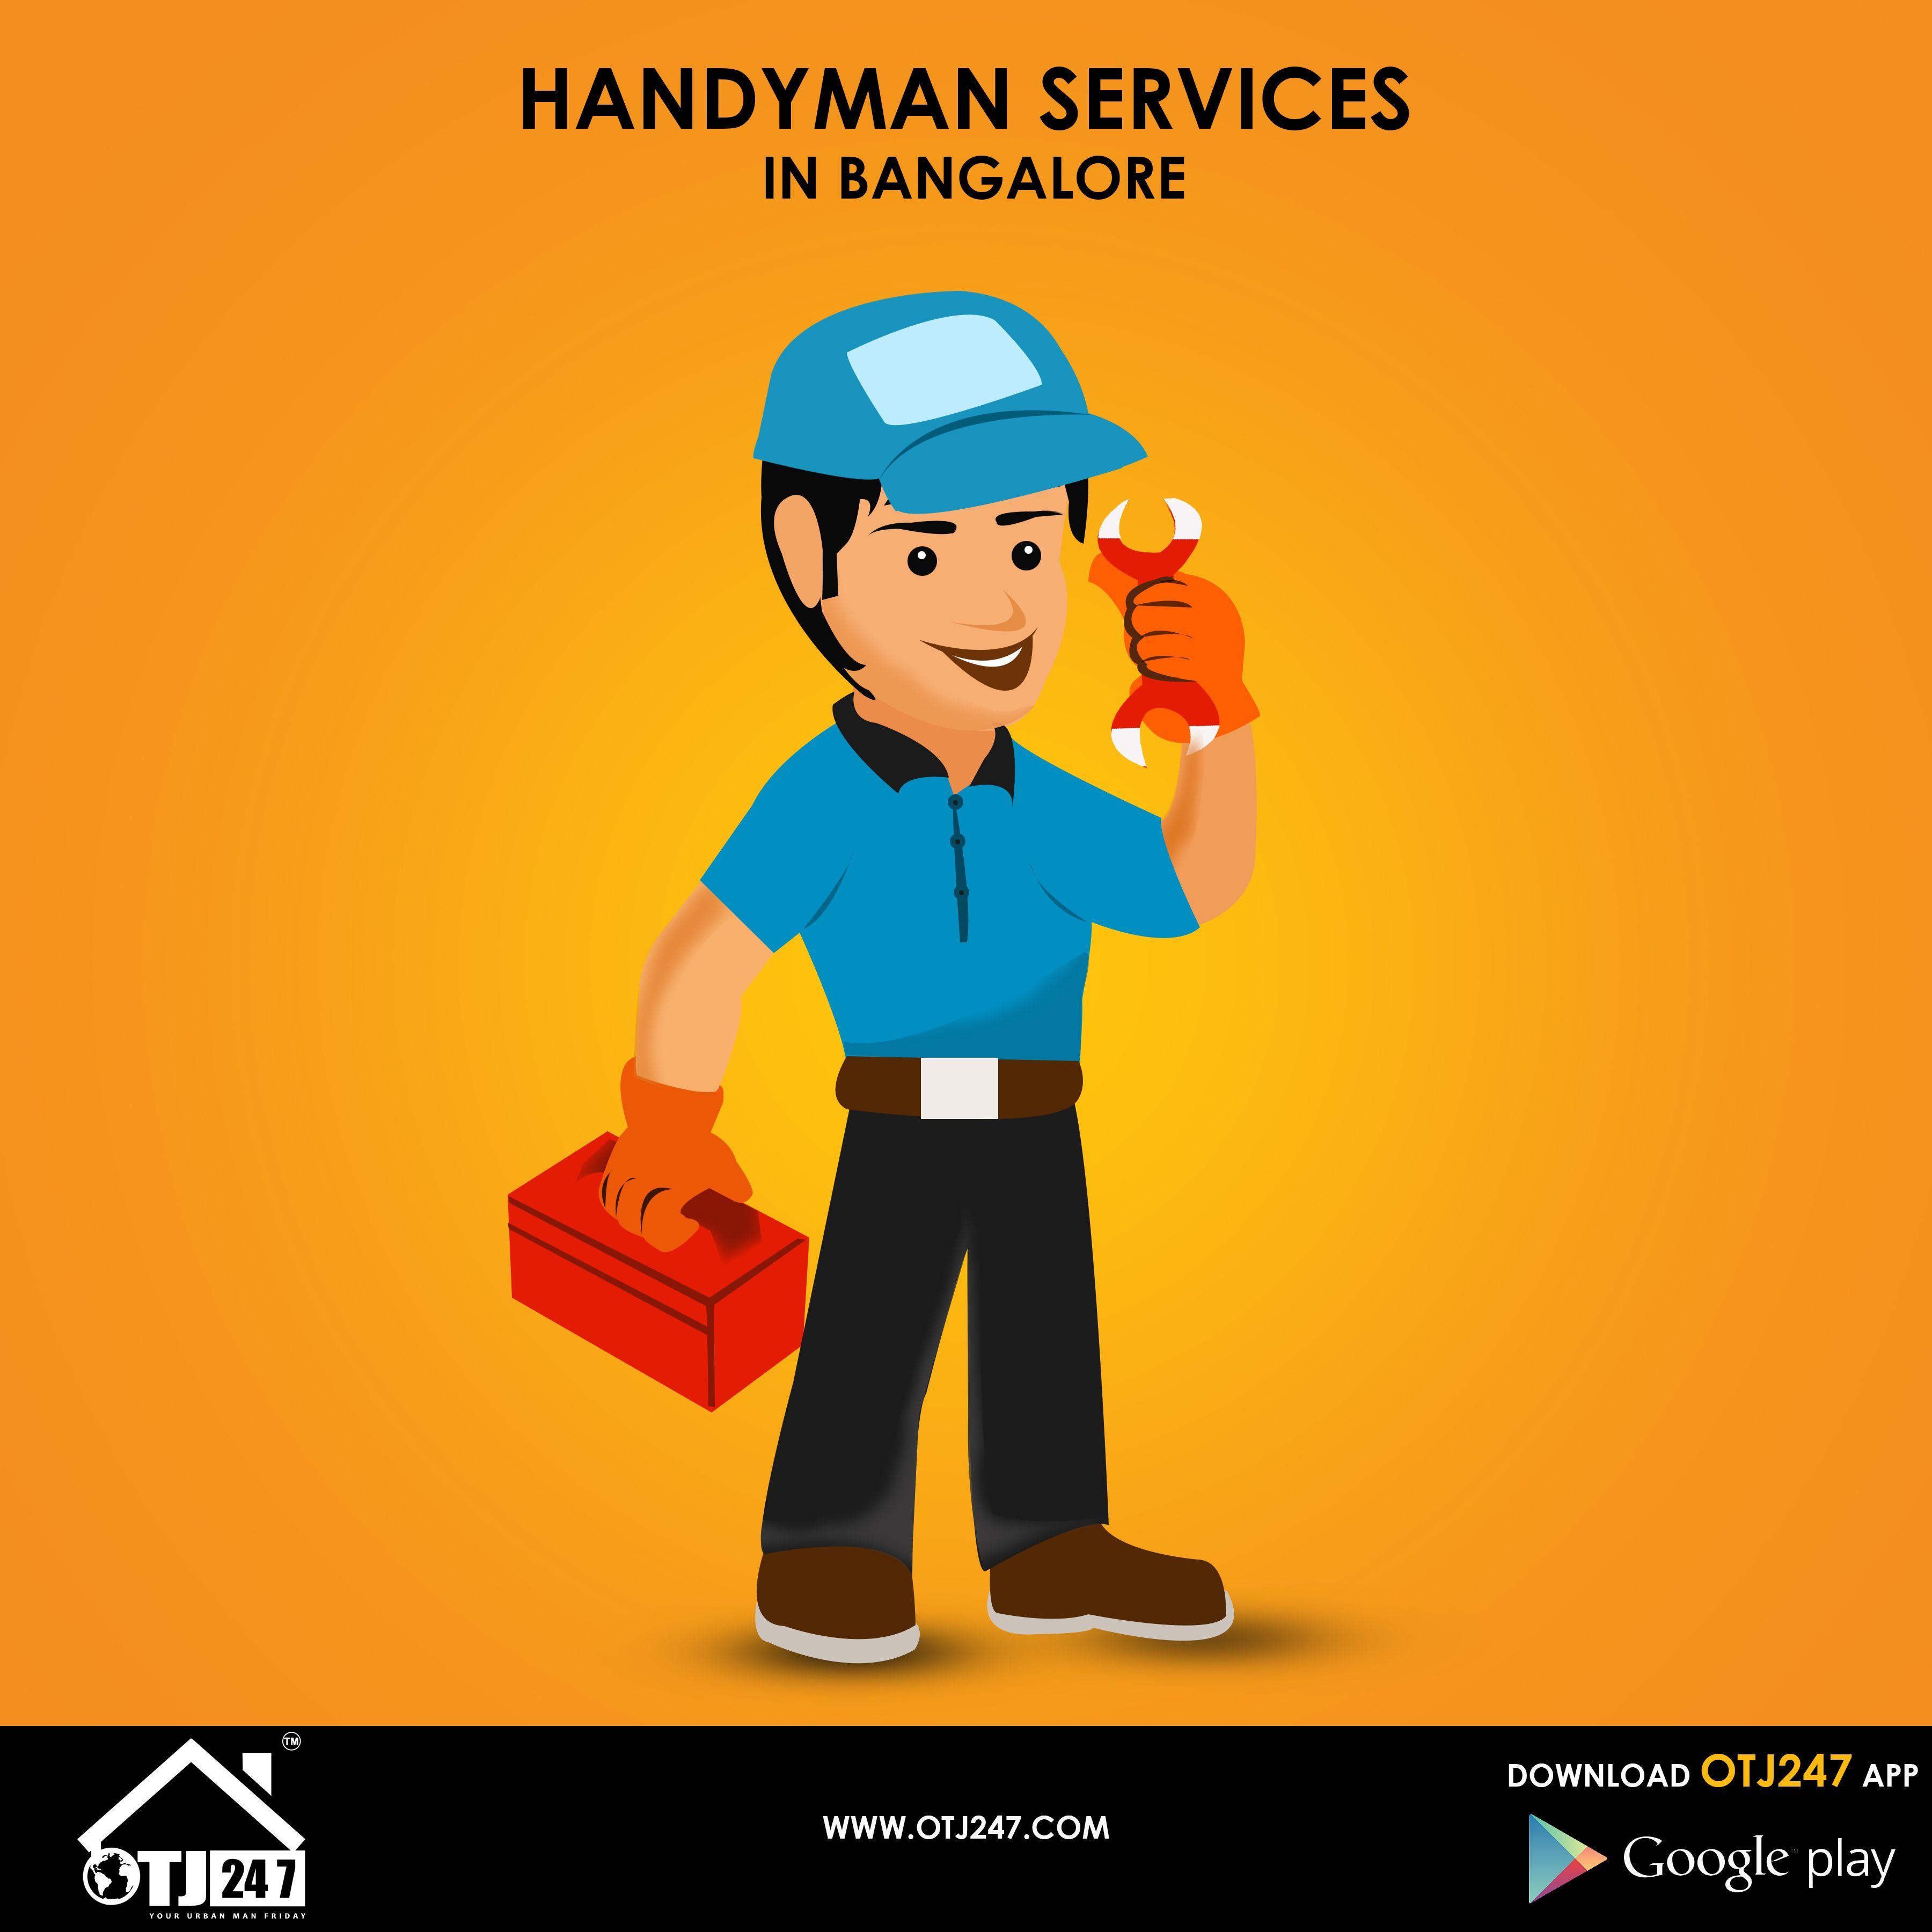 Pin by OTJ247 on OTJ247 COM Services | App store, Carpentry, Plumbing